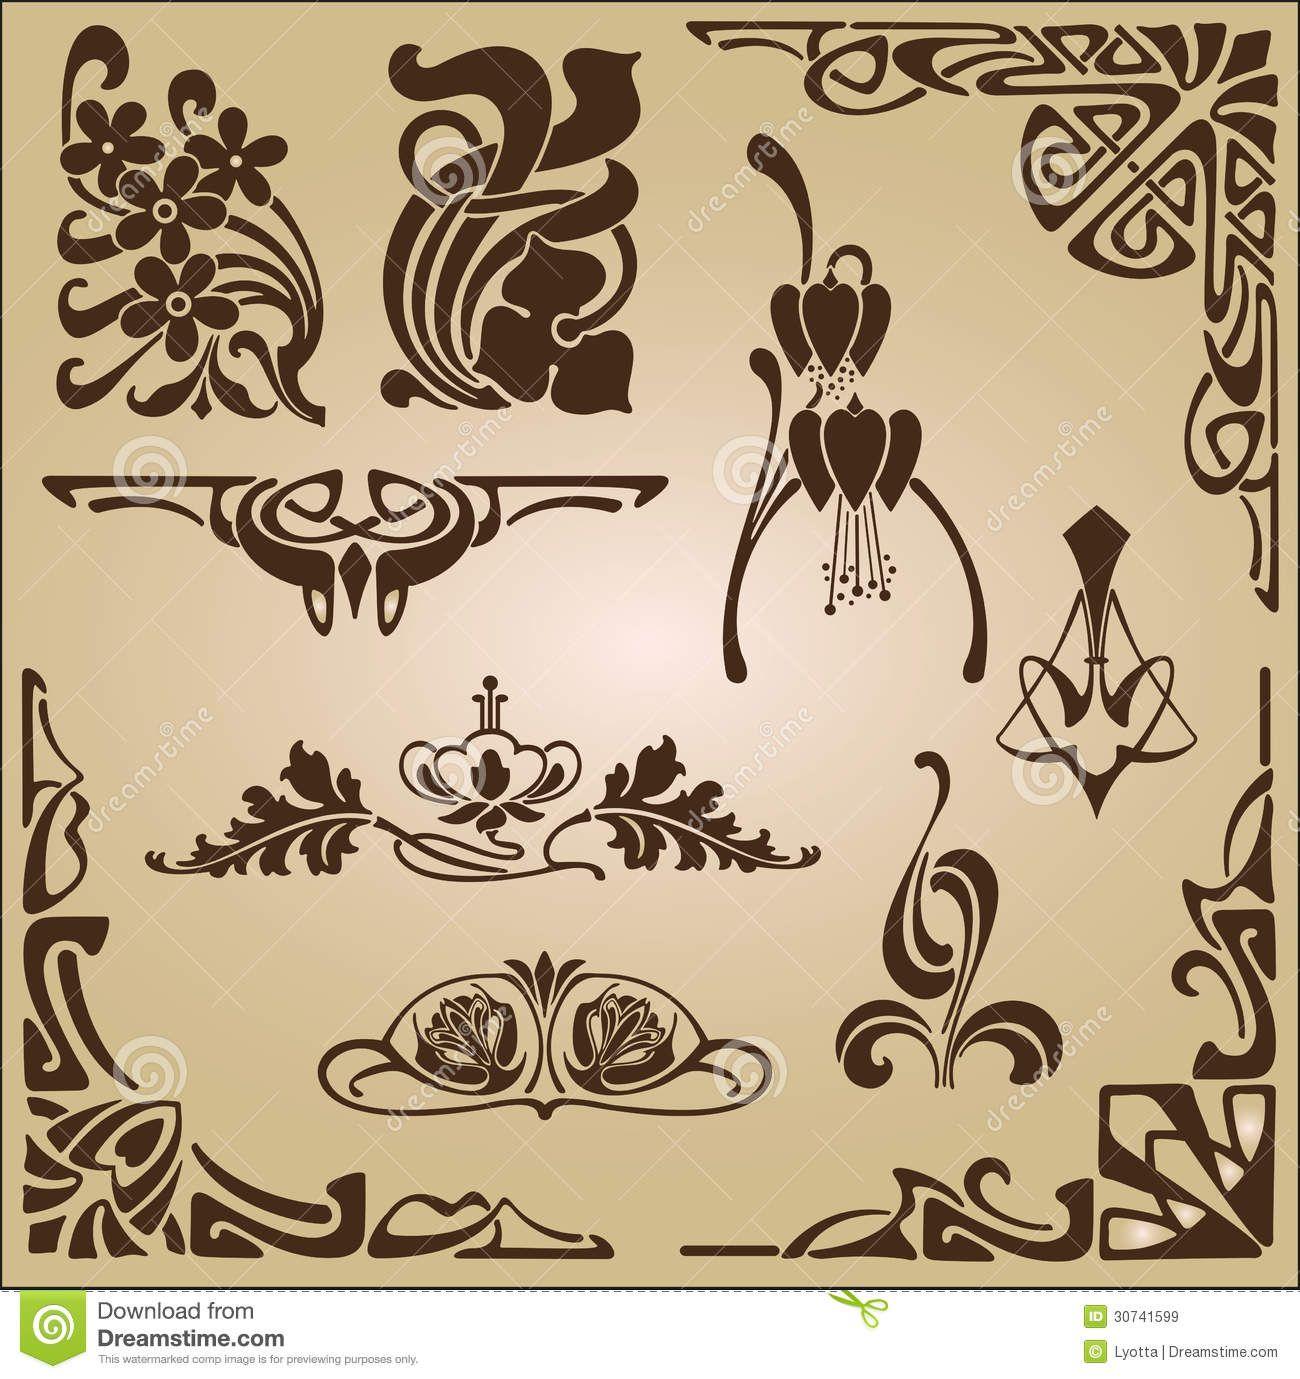 pin von phoebe troiani auf tatt inspiration pinterest. Black Bedroom Furniture Sets. Home Design Ideas